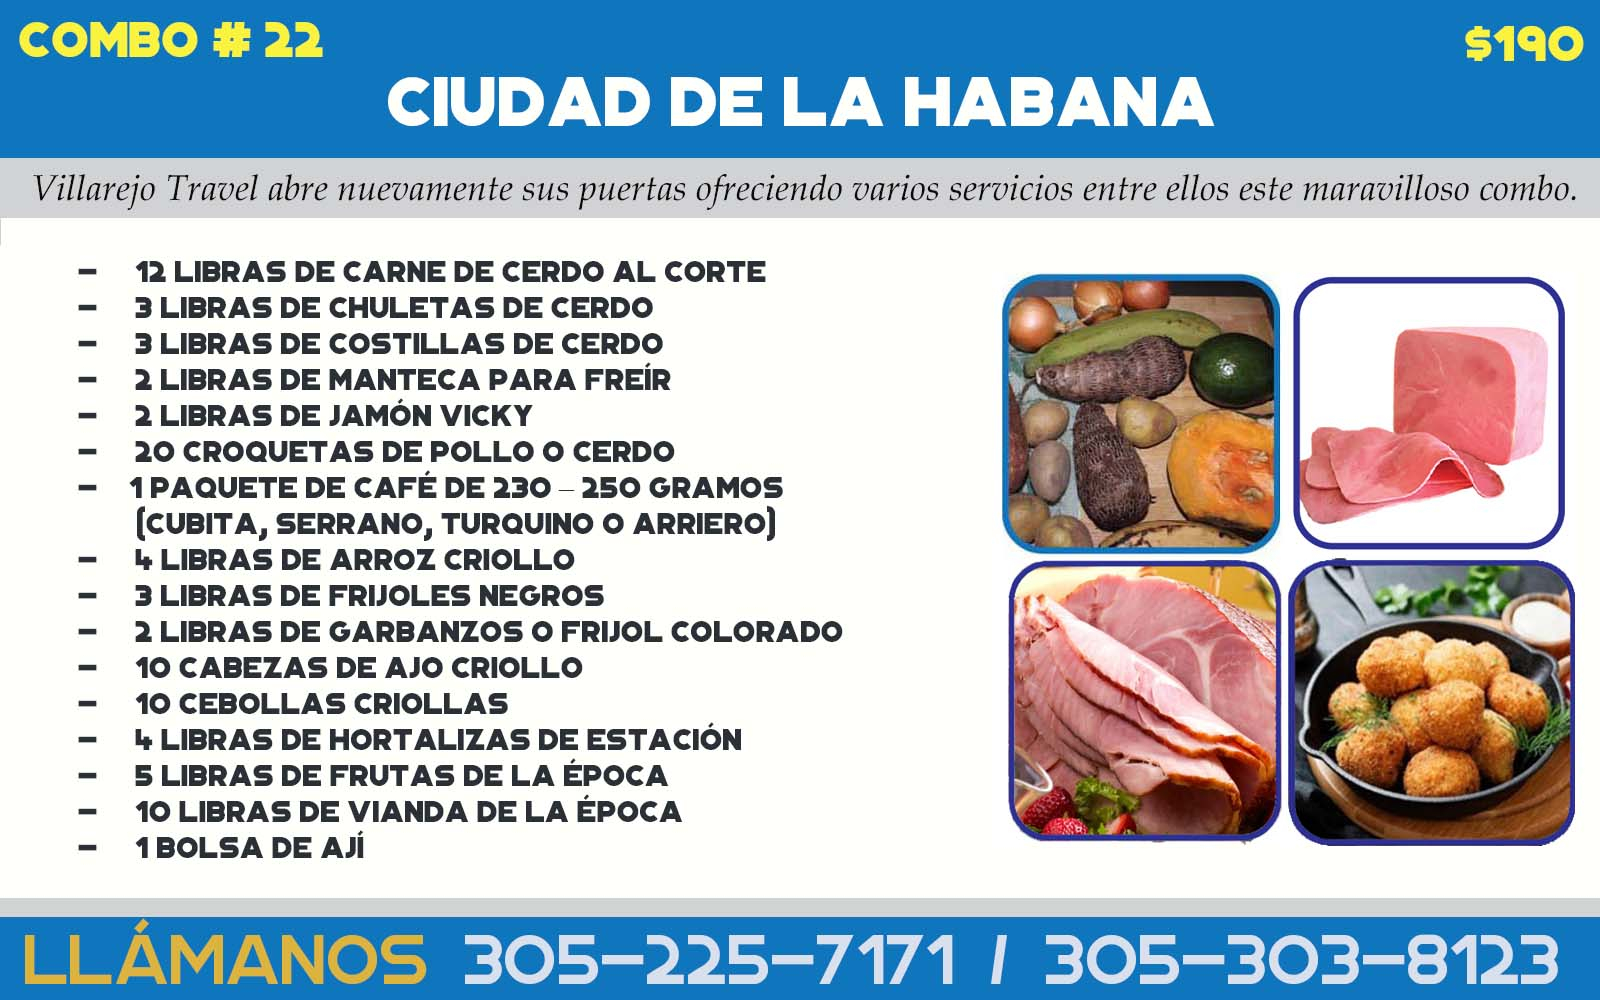 COMBO # 22 CIUDAD DE LA HABANA  (Mixto)